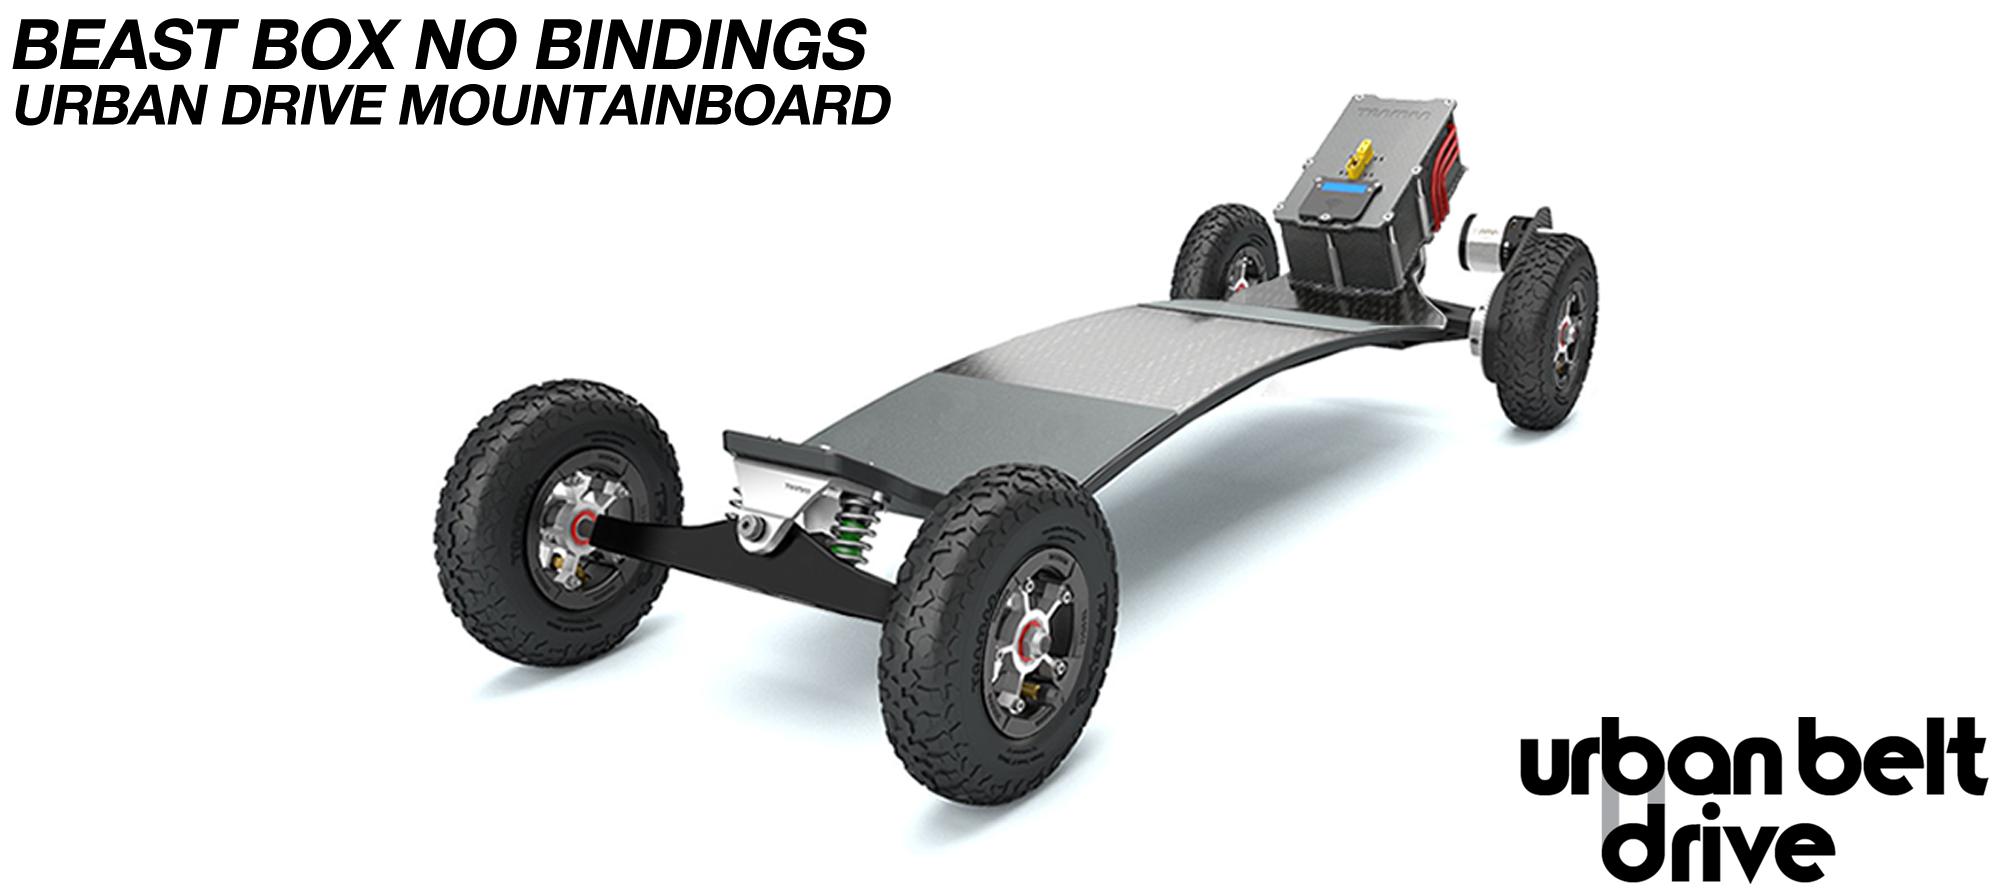 URBAN Electric Mountainboard - Urban Motor Mounts on custom TRAMPA deck ATB Trucks custom 8 inch Wheels with BEAST Box Single VESC - NO BINDINGS